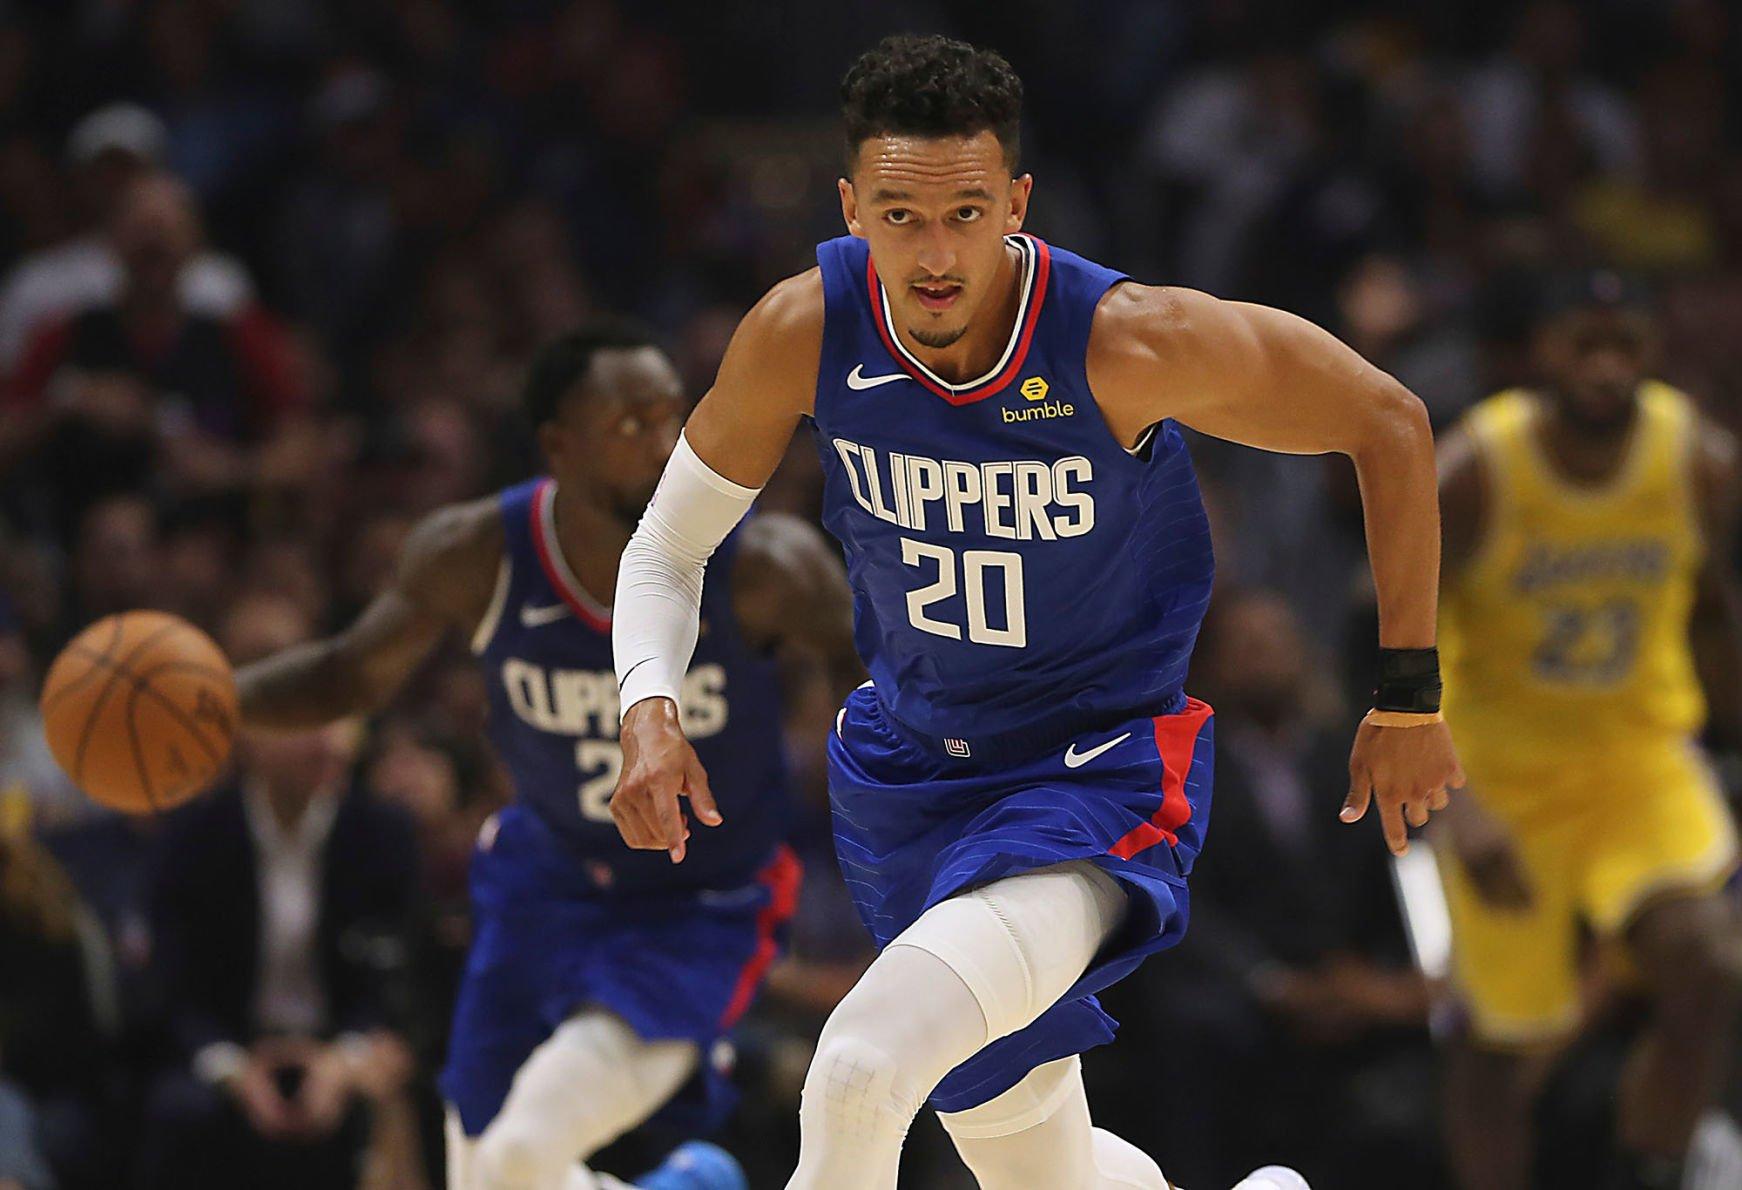 Village helped Clippers' Shamet mature | National Sports ...